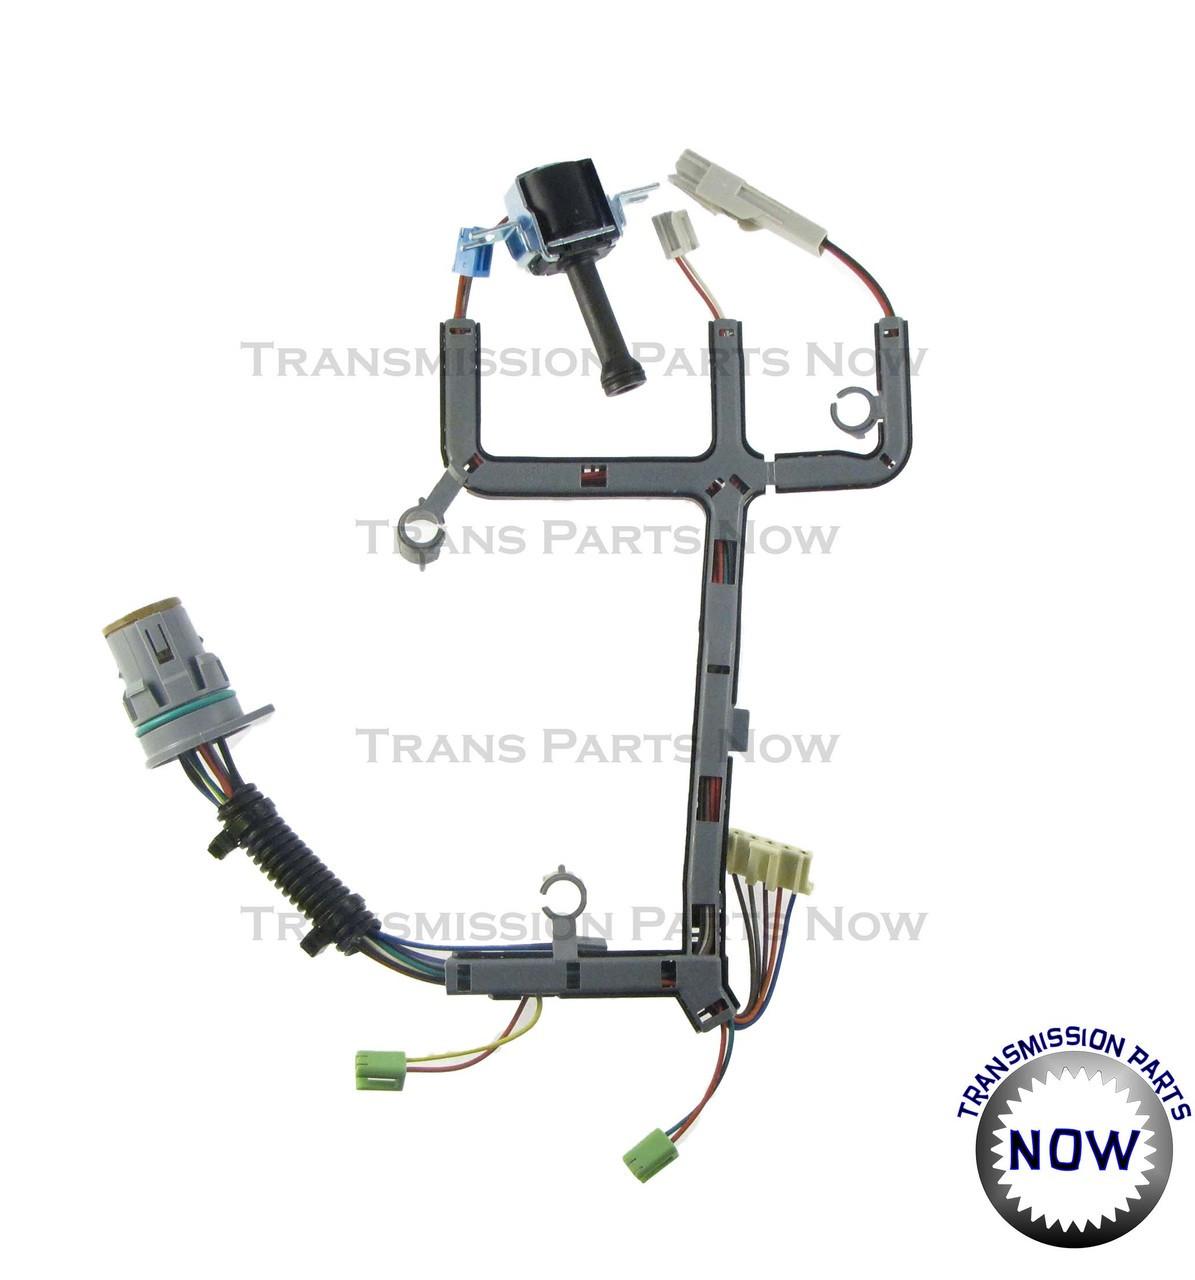 medium resolution of internal wire harness 2006 2008 rostra w iss 51869p